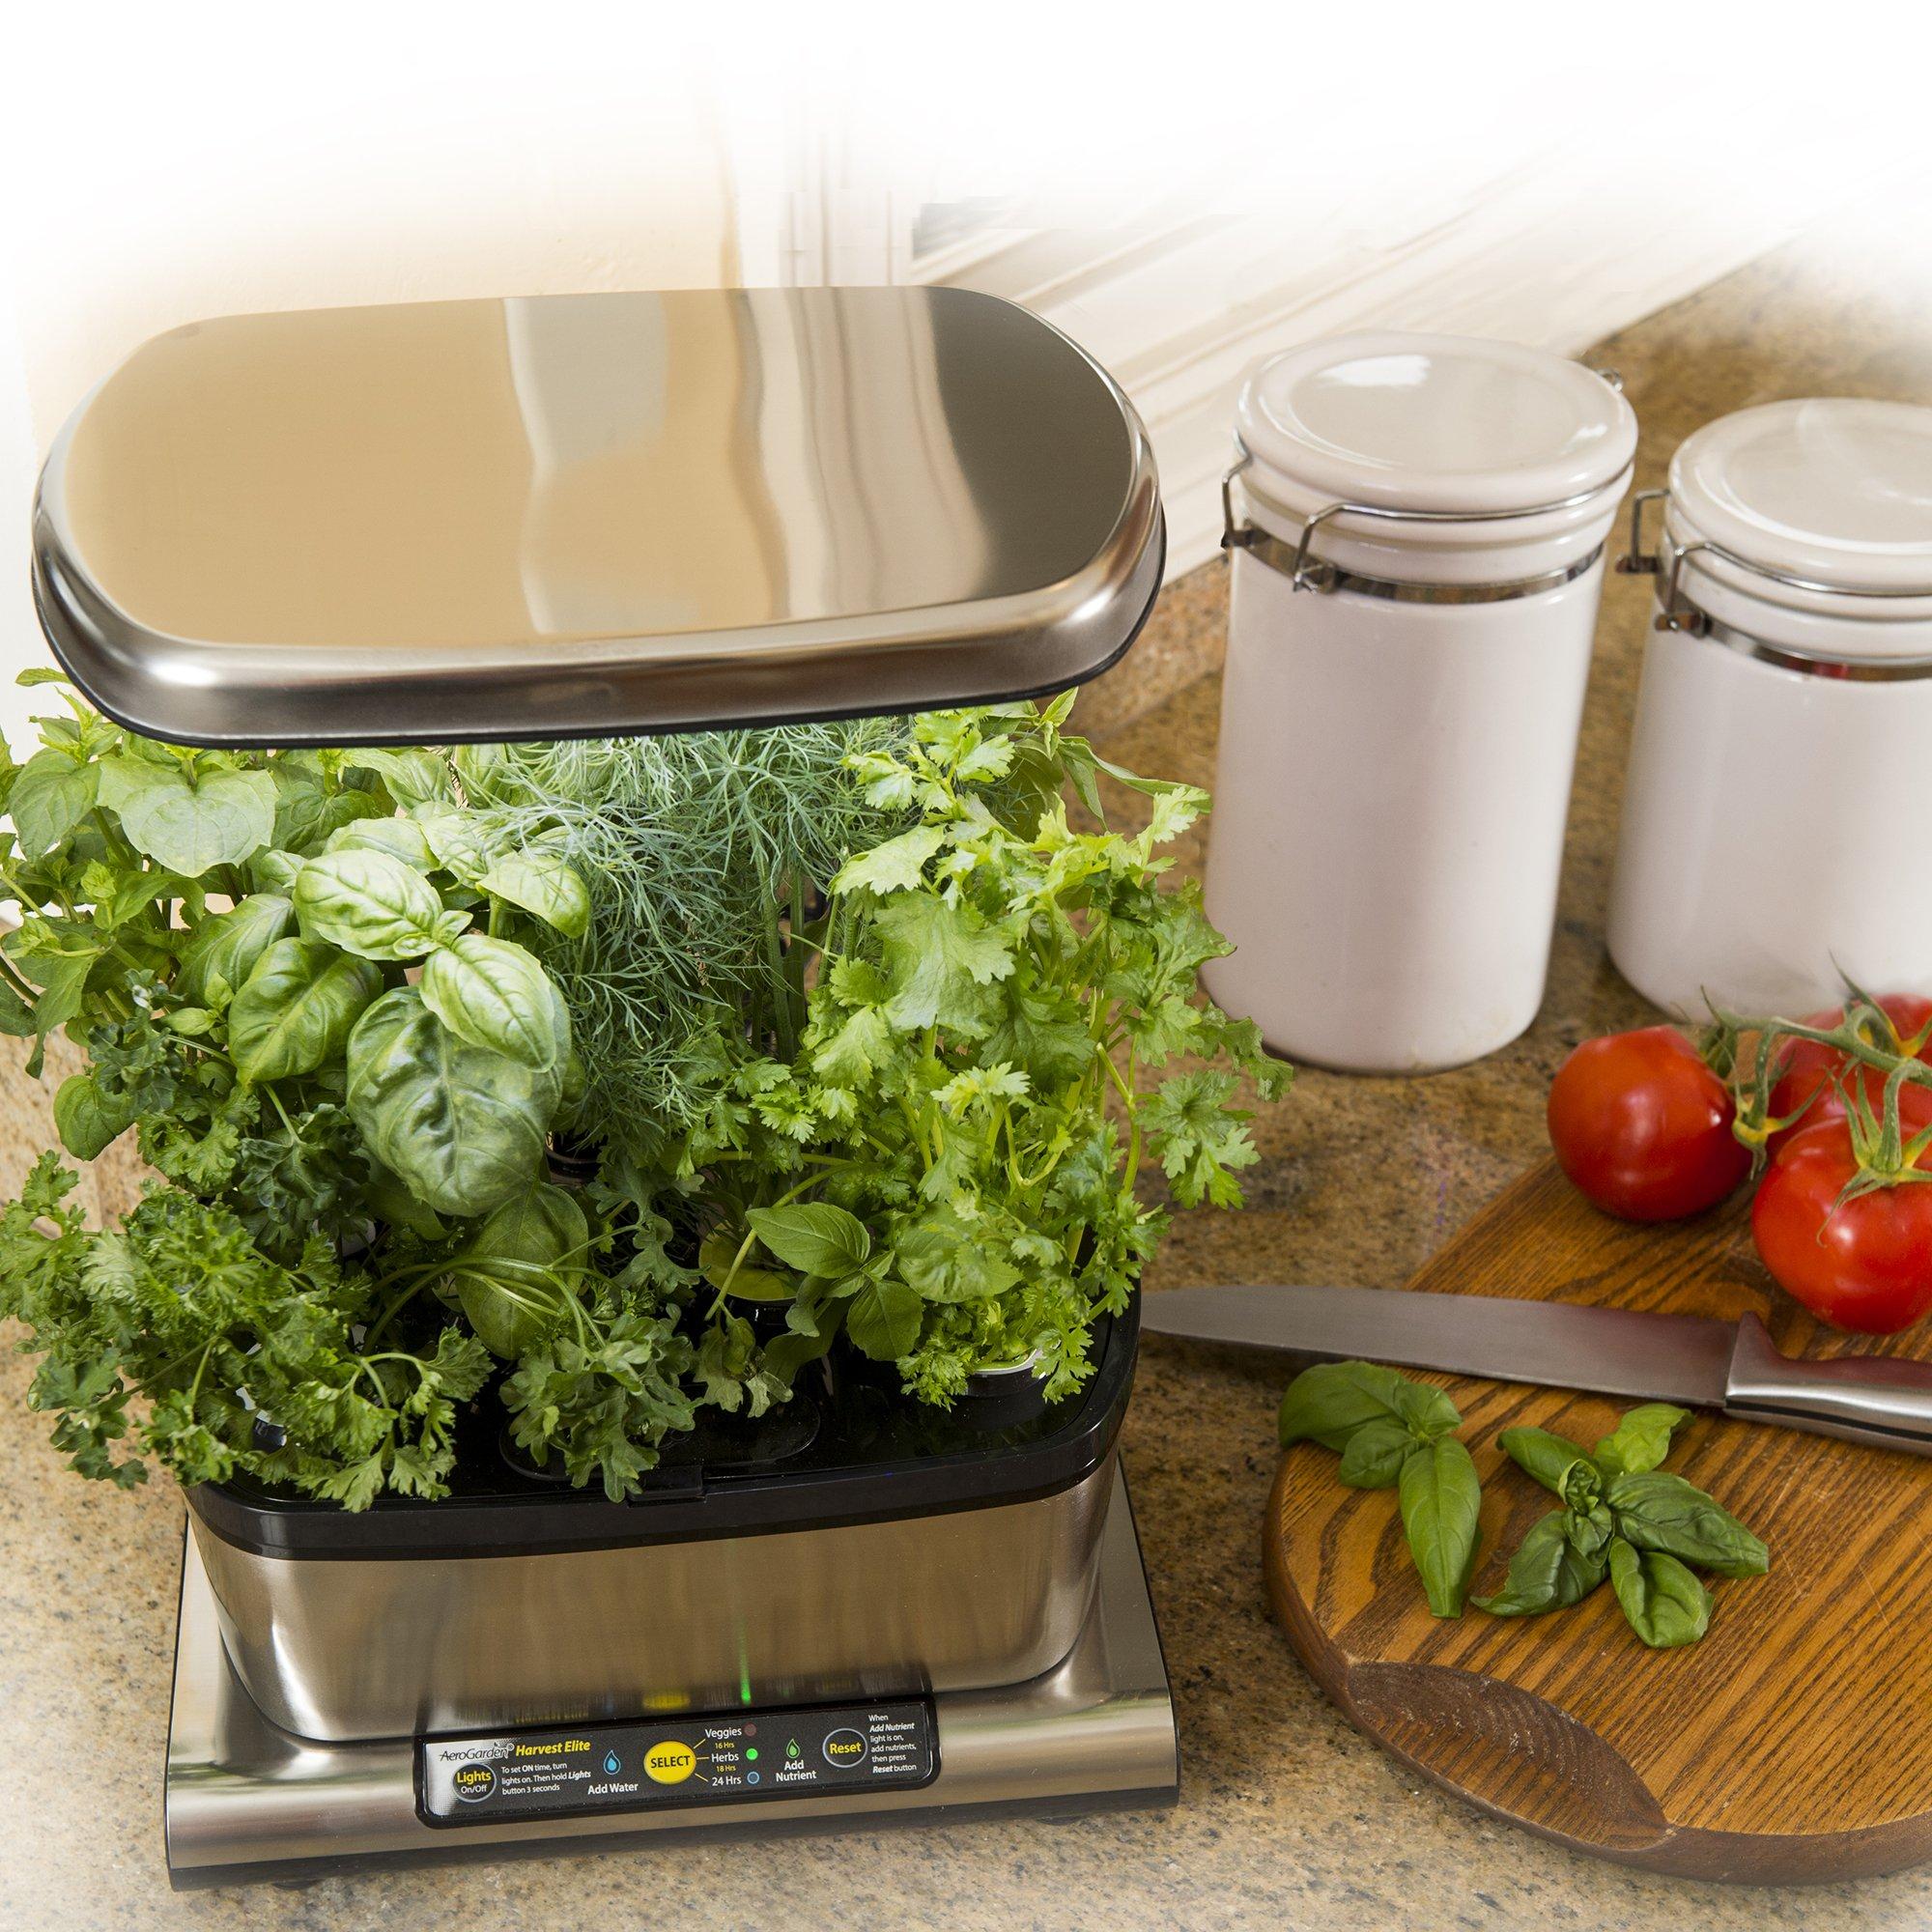 AeroGarden Harvest Elite with Gourmet Herb Seed Pod Kit, Stainless Steel by AeroGrow (Image #6)